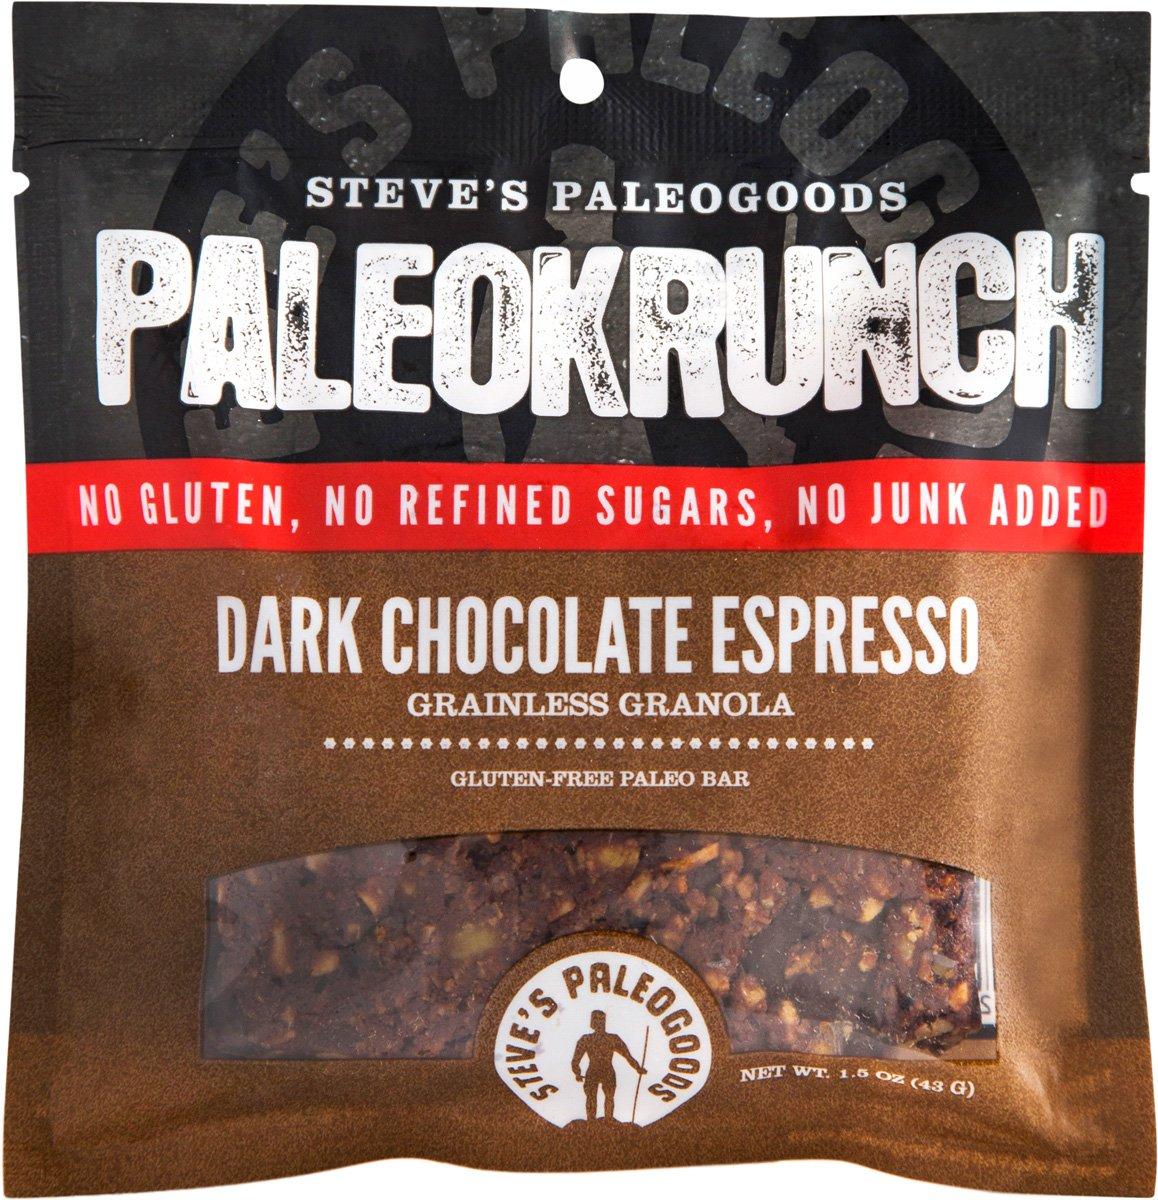 Steve's Paleogoods, PaleoKrunch Bar Dark Chocolate Espresso, 1.5 oz (Pack of 3)